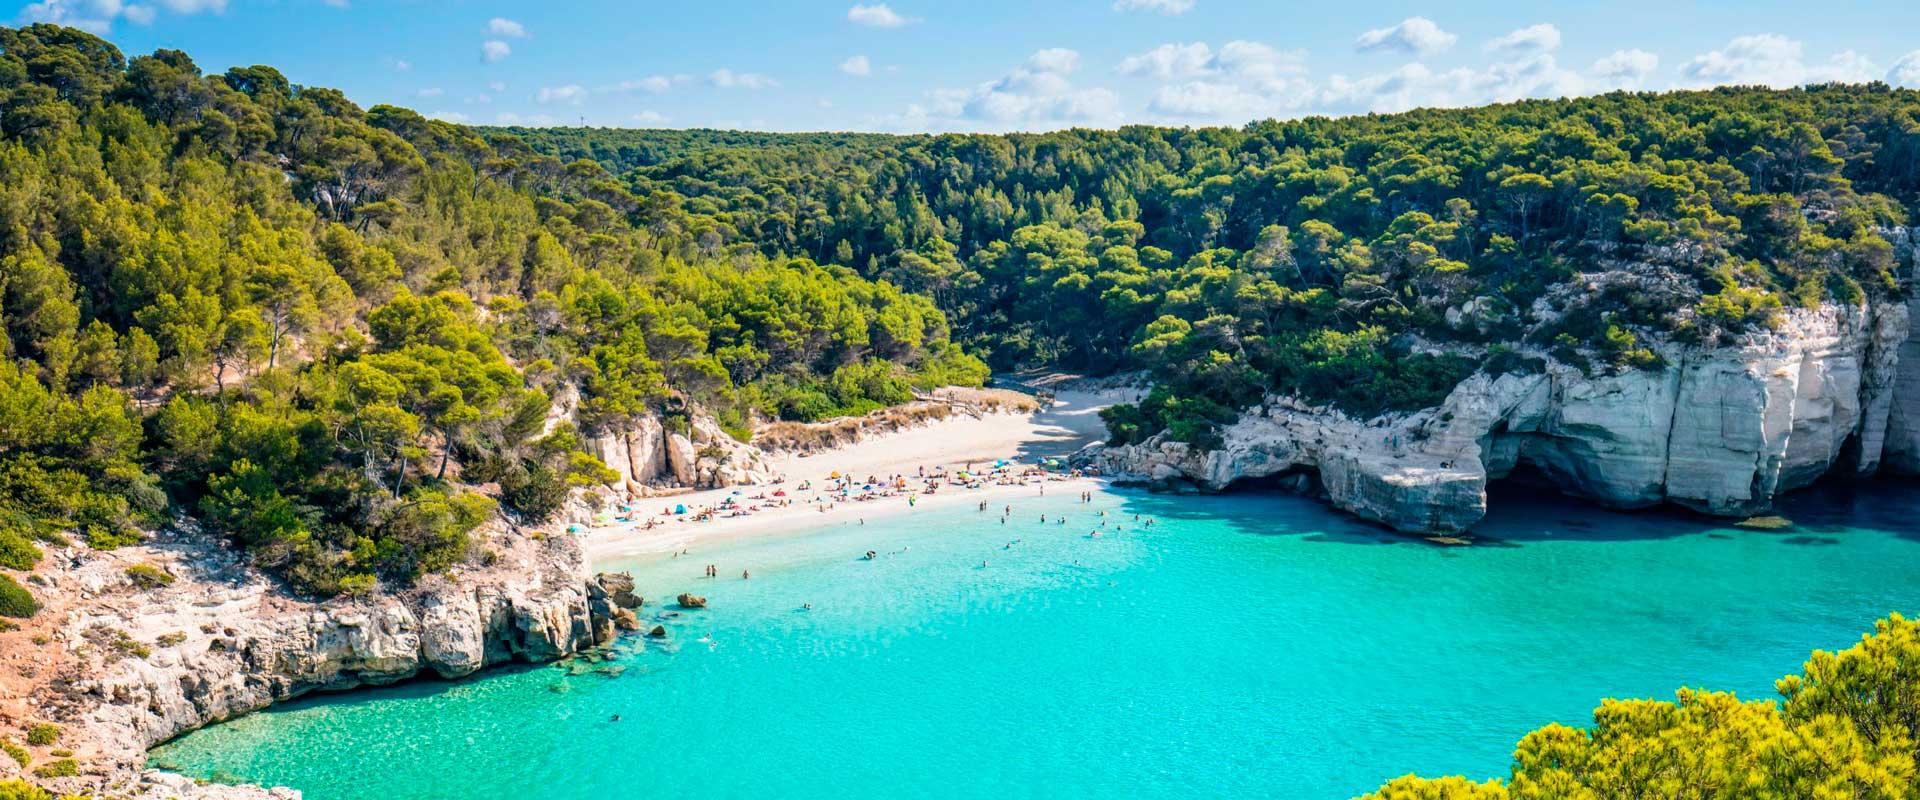 Viajes Islas Baleares -Menorca